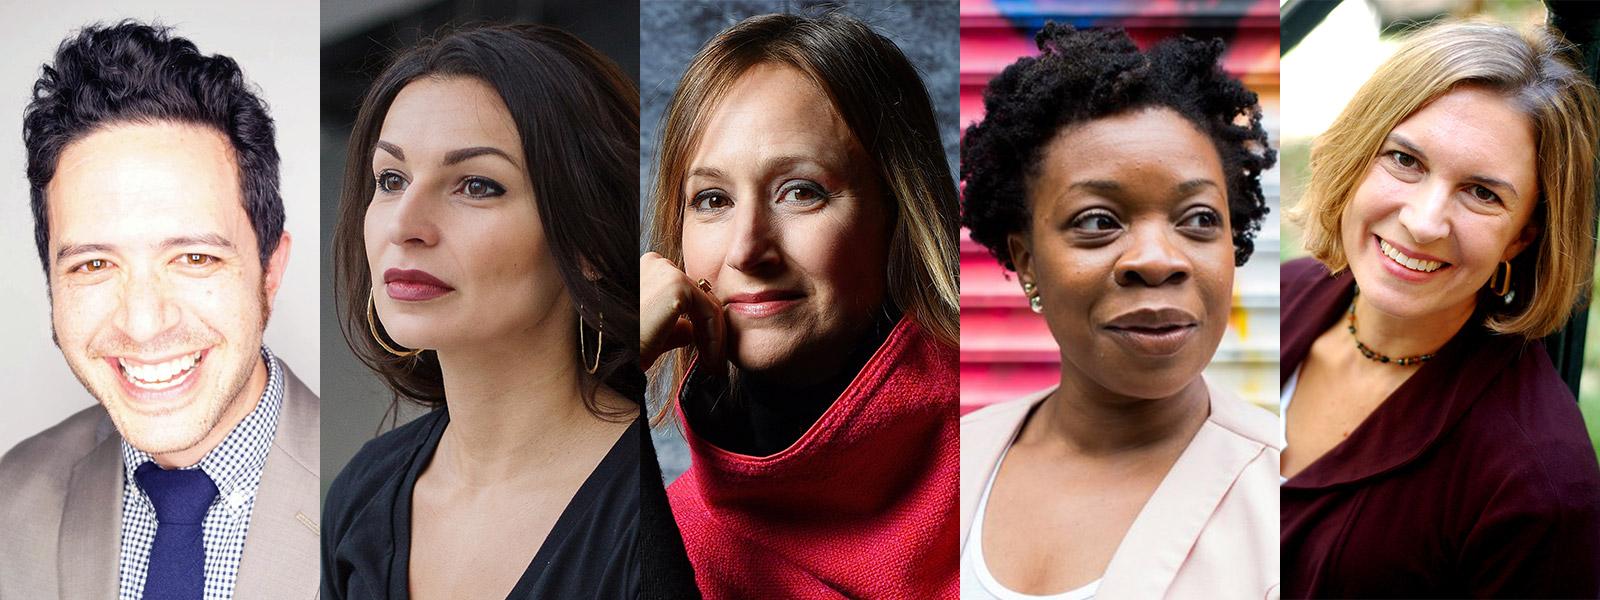 Playwrights: Adam Gwon, Martyna Majok, Heather Raffo, Mfoniso Udofia, Karen Zacarías  Directed by Elena Araoz